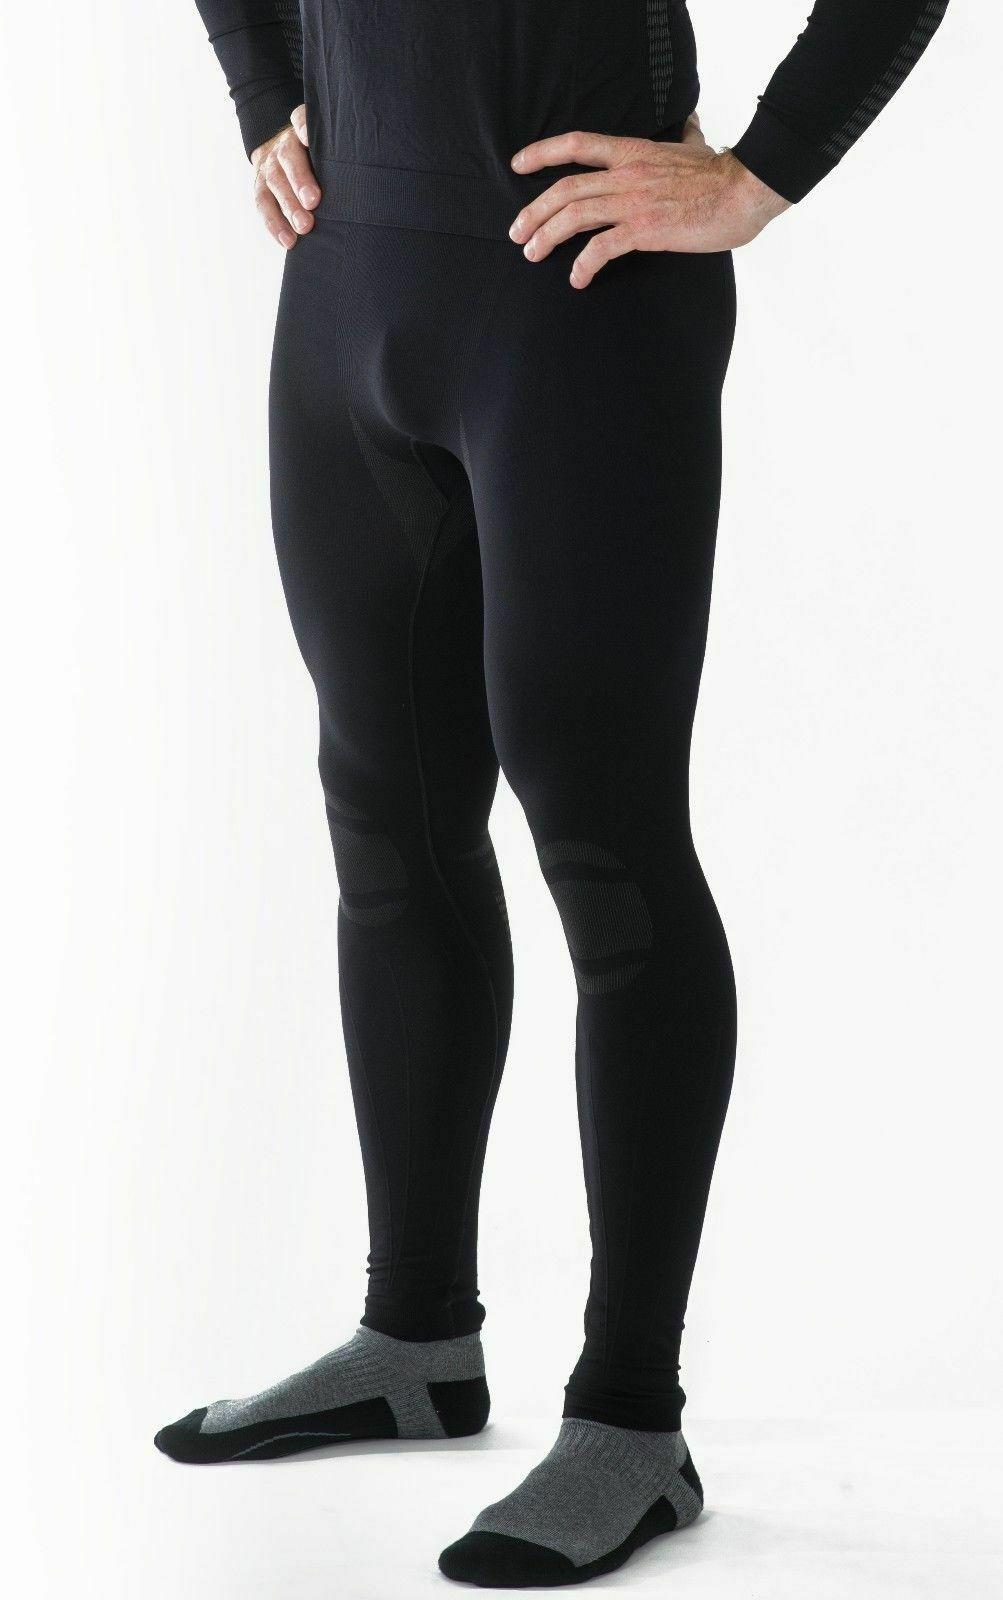 Issimo-Men-039-s-Sports-Stretchy-Leggings-Moisture-Wicking-Training-Pants thumbnail 12